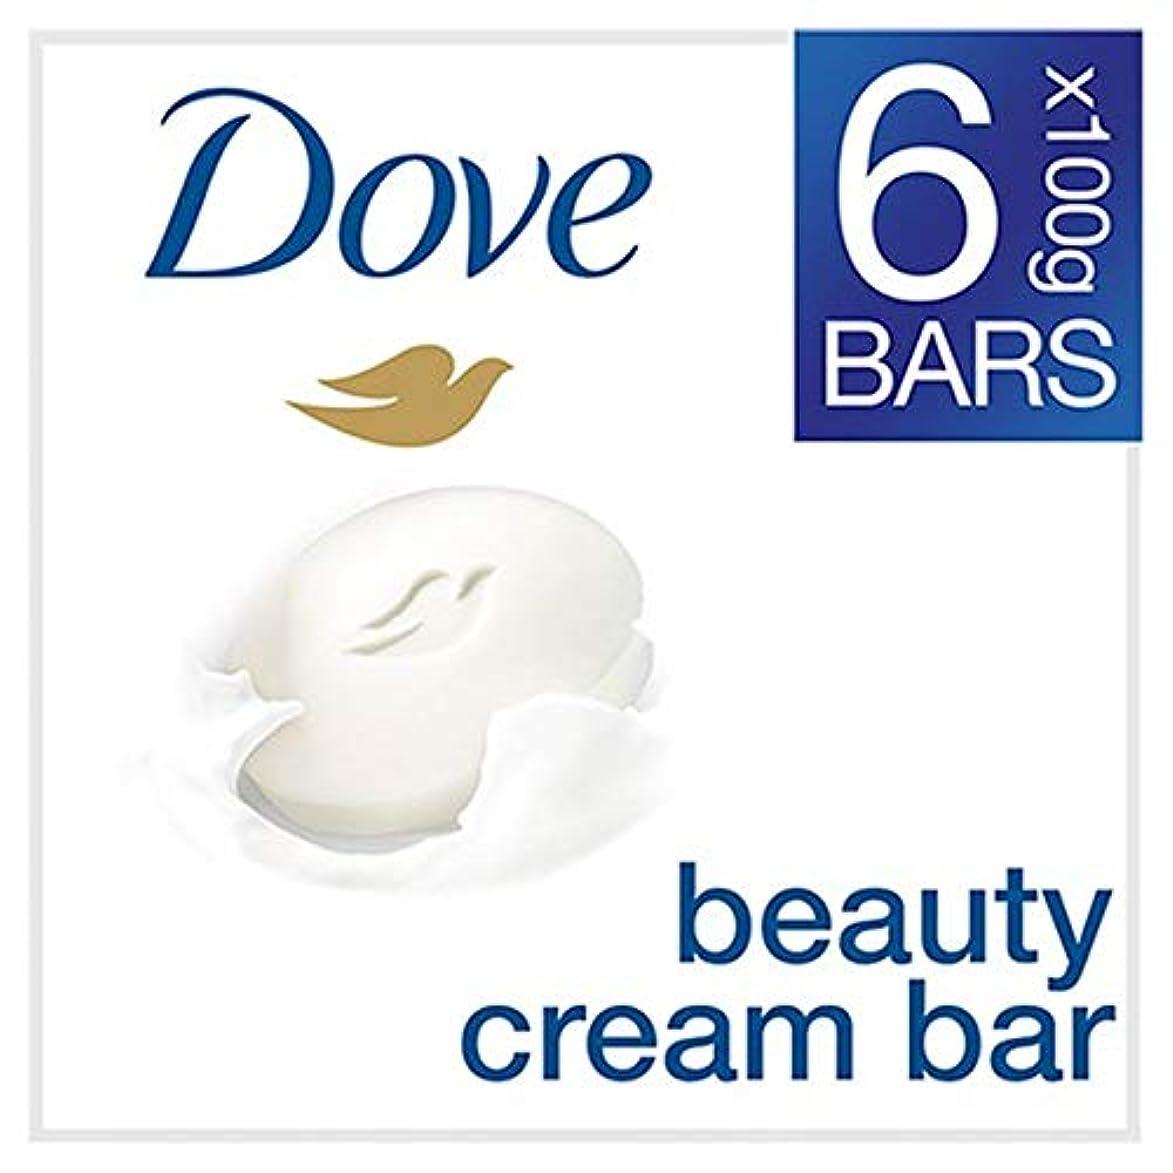 [Dove ] 鳩元固形石鹸6X100G - Dove Original Bar Soap 6X100g [並行輸入品]